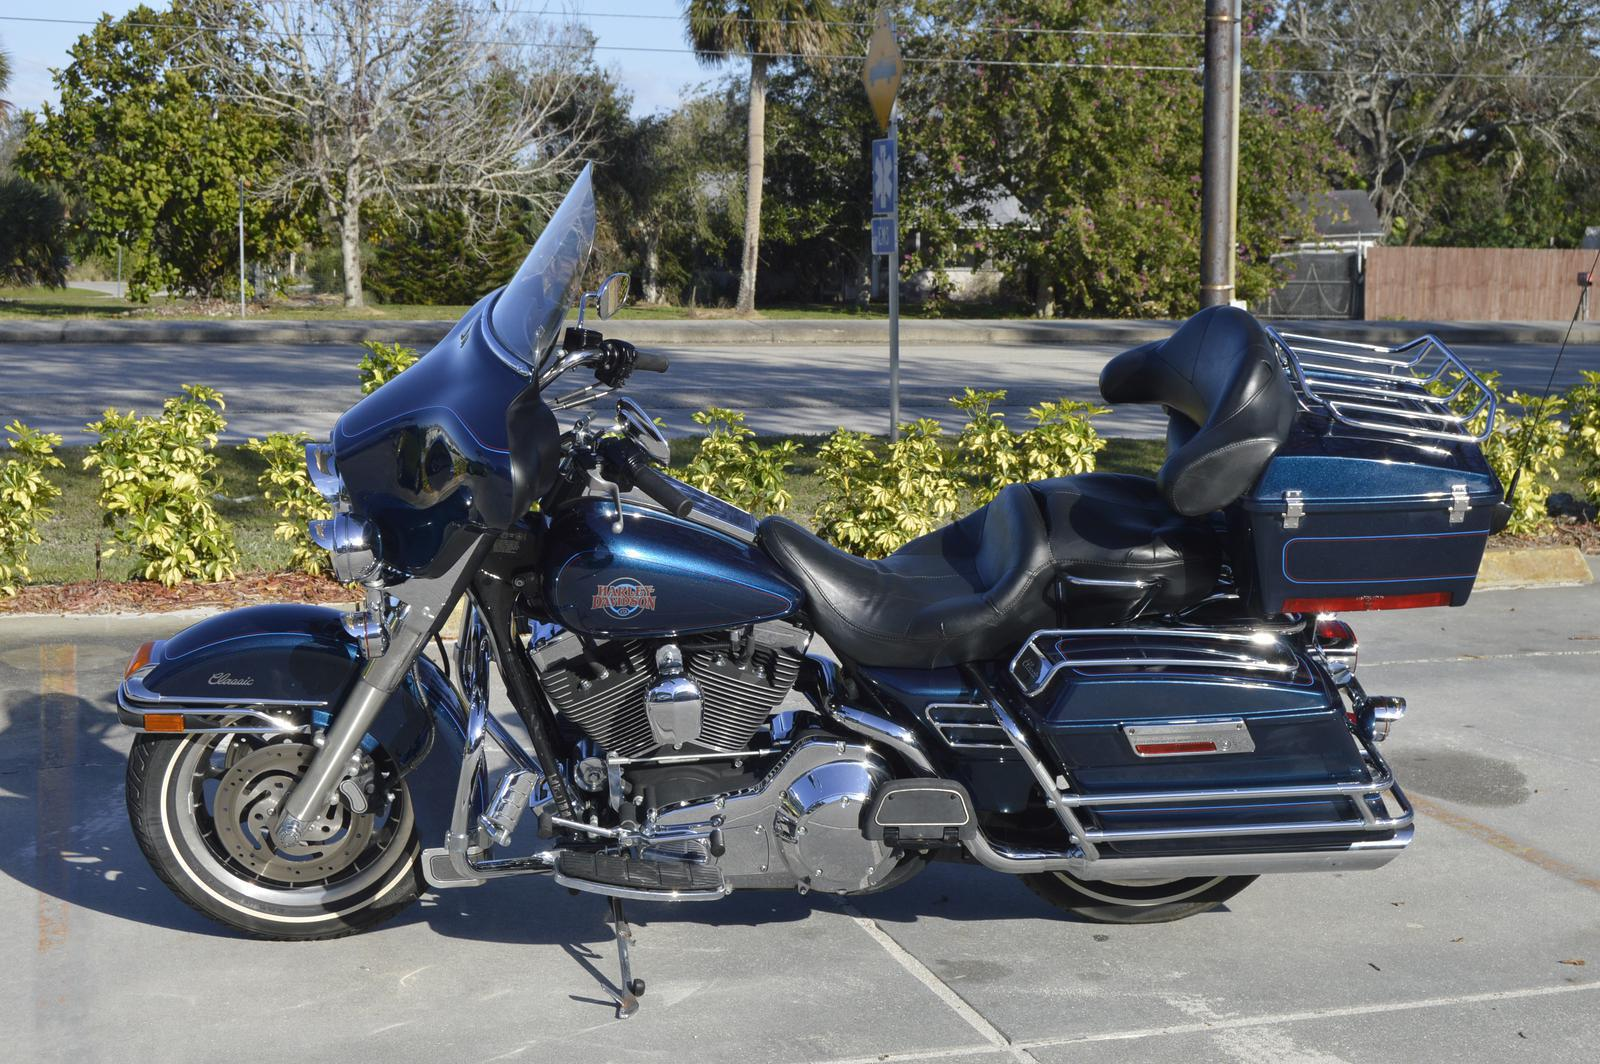 Craigslist Treasure Coast Motorcycles Motorjdi Co